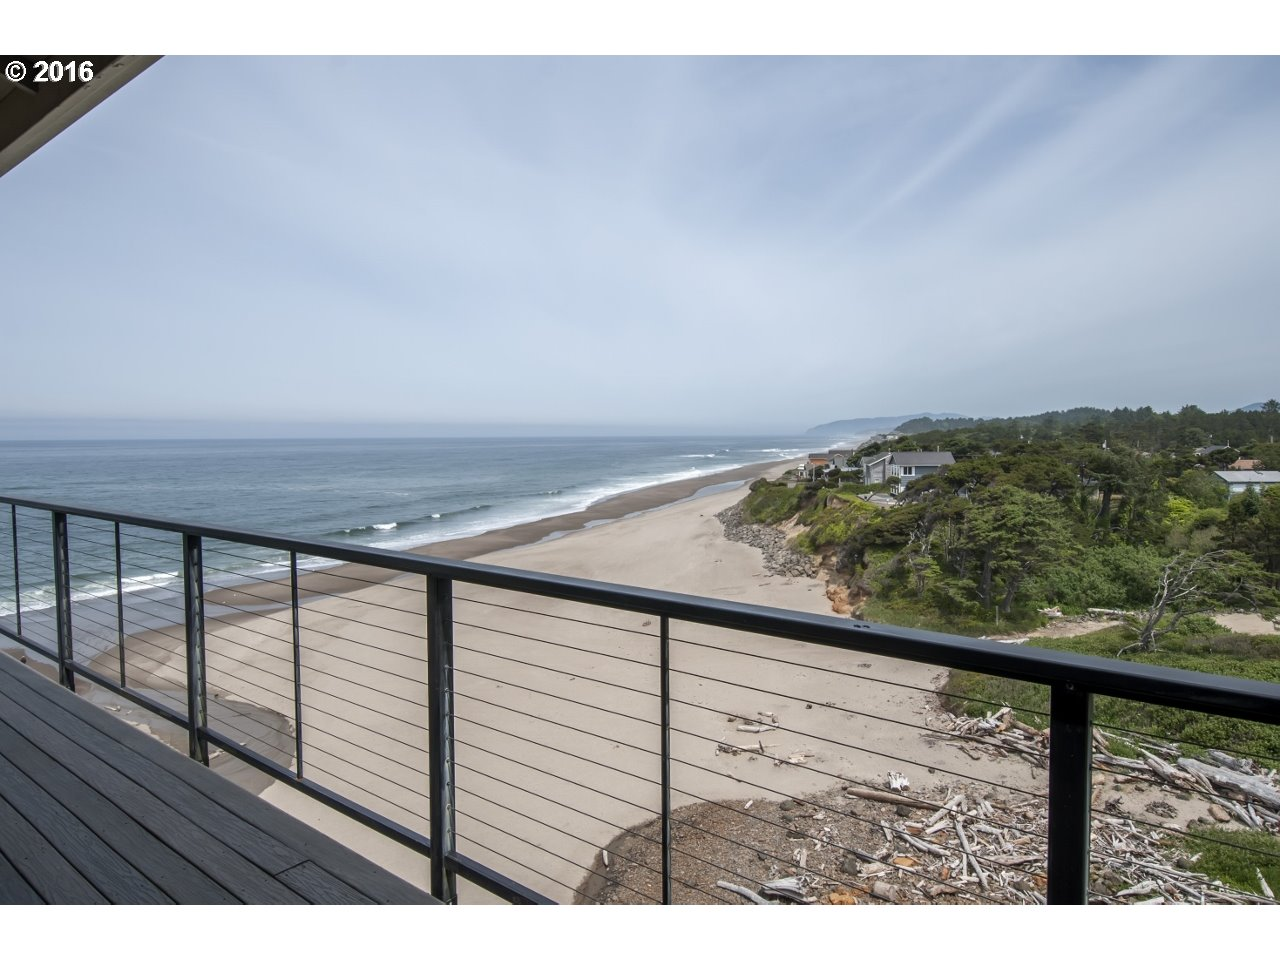 5995 EL MAR CT Gleneden Beach, OR 97388 - MLS #: 16261986